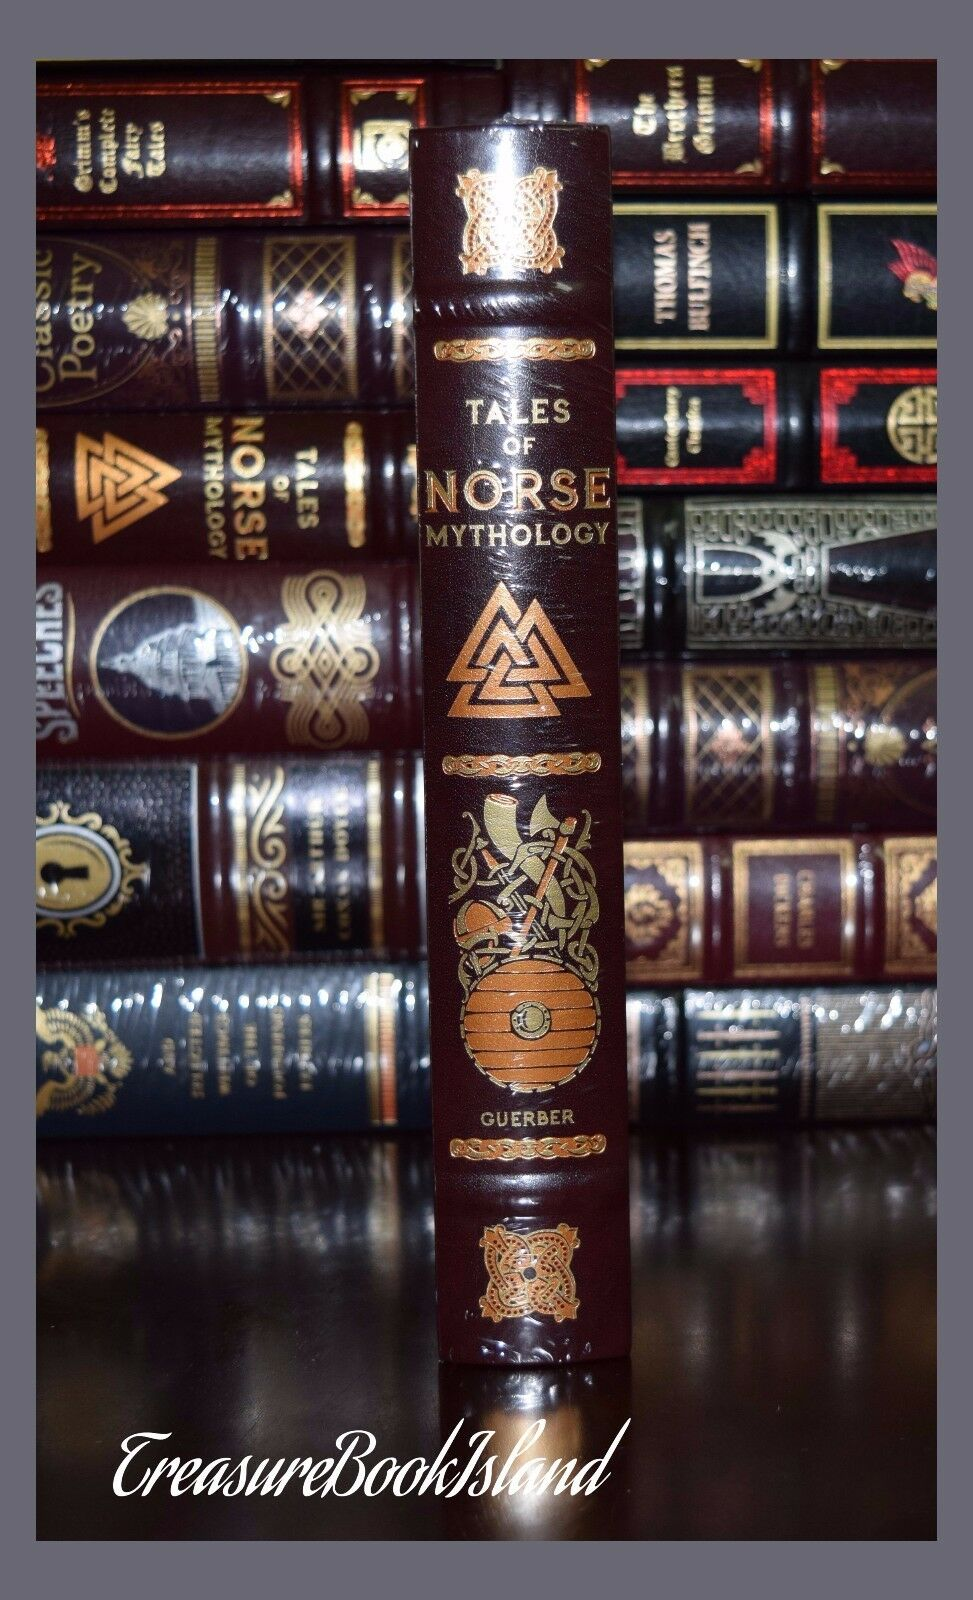 Tales of Norse Mythology Viking Tales Illustrated New Sealed Leather Hardcover